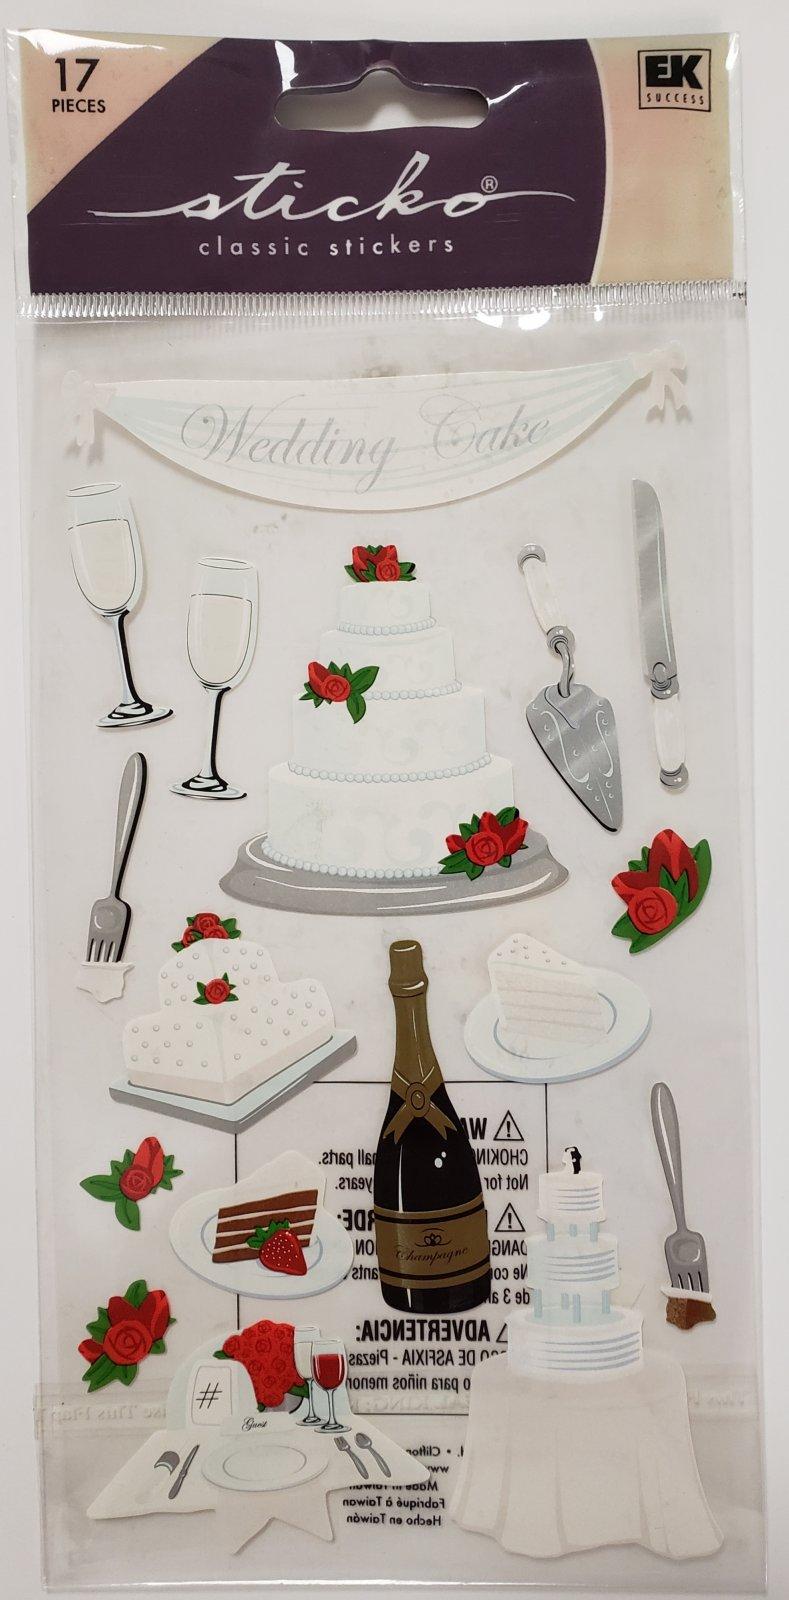 Sticko Wedding Cake